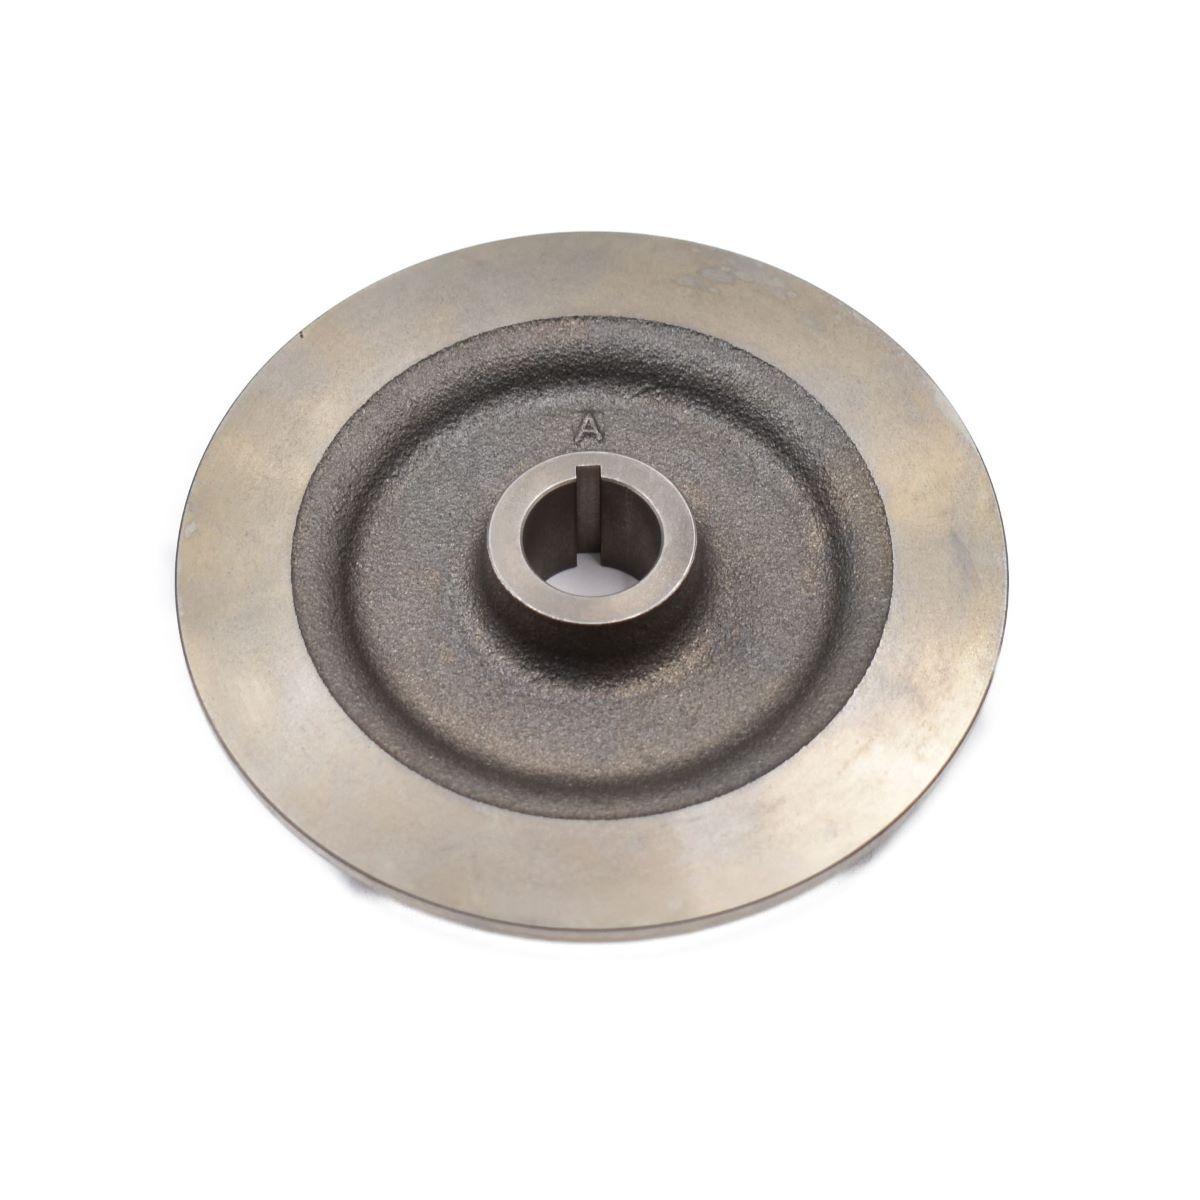 7066-751-30V-A4 706675130CA4 26mm 134mm 22mm